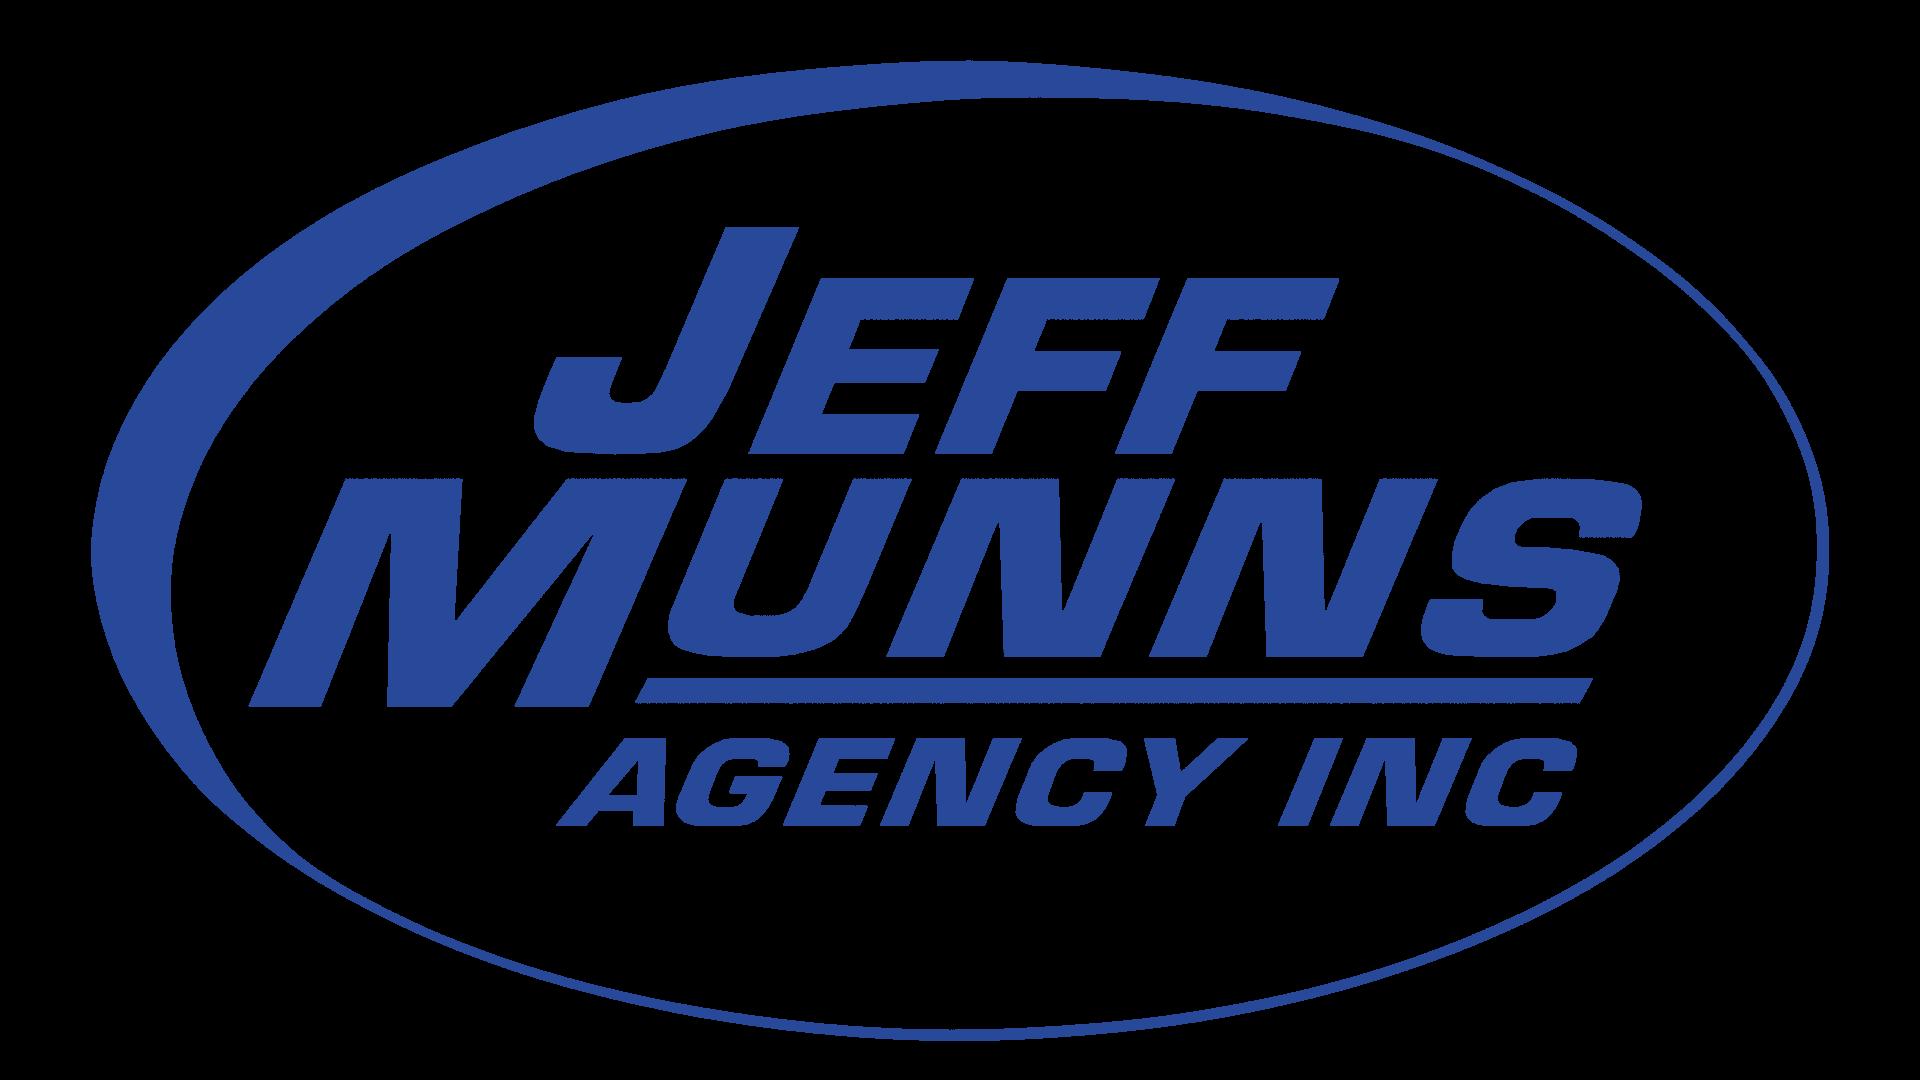 Insurance Agency In Lincoln Ne Jeff Munns Agency Inc